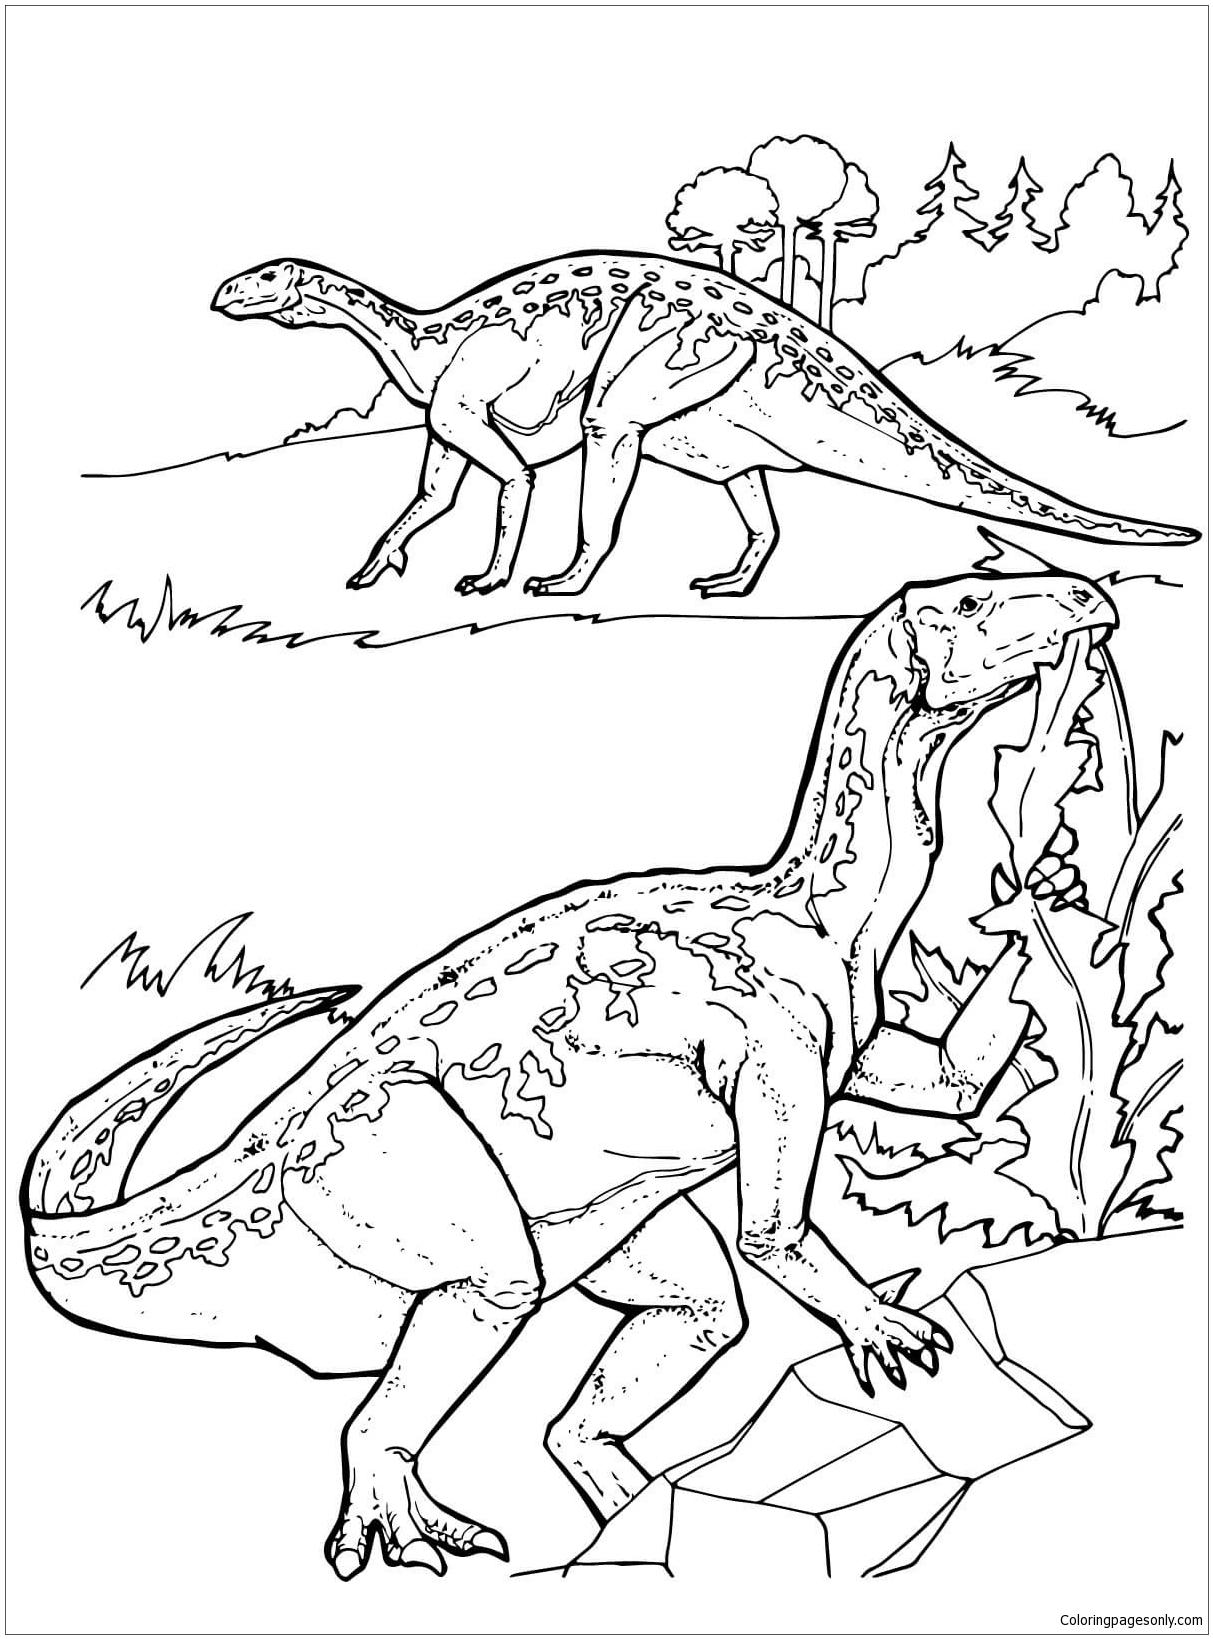 Iguanodon Dinosaurs 1 Coloring Page